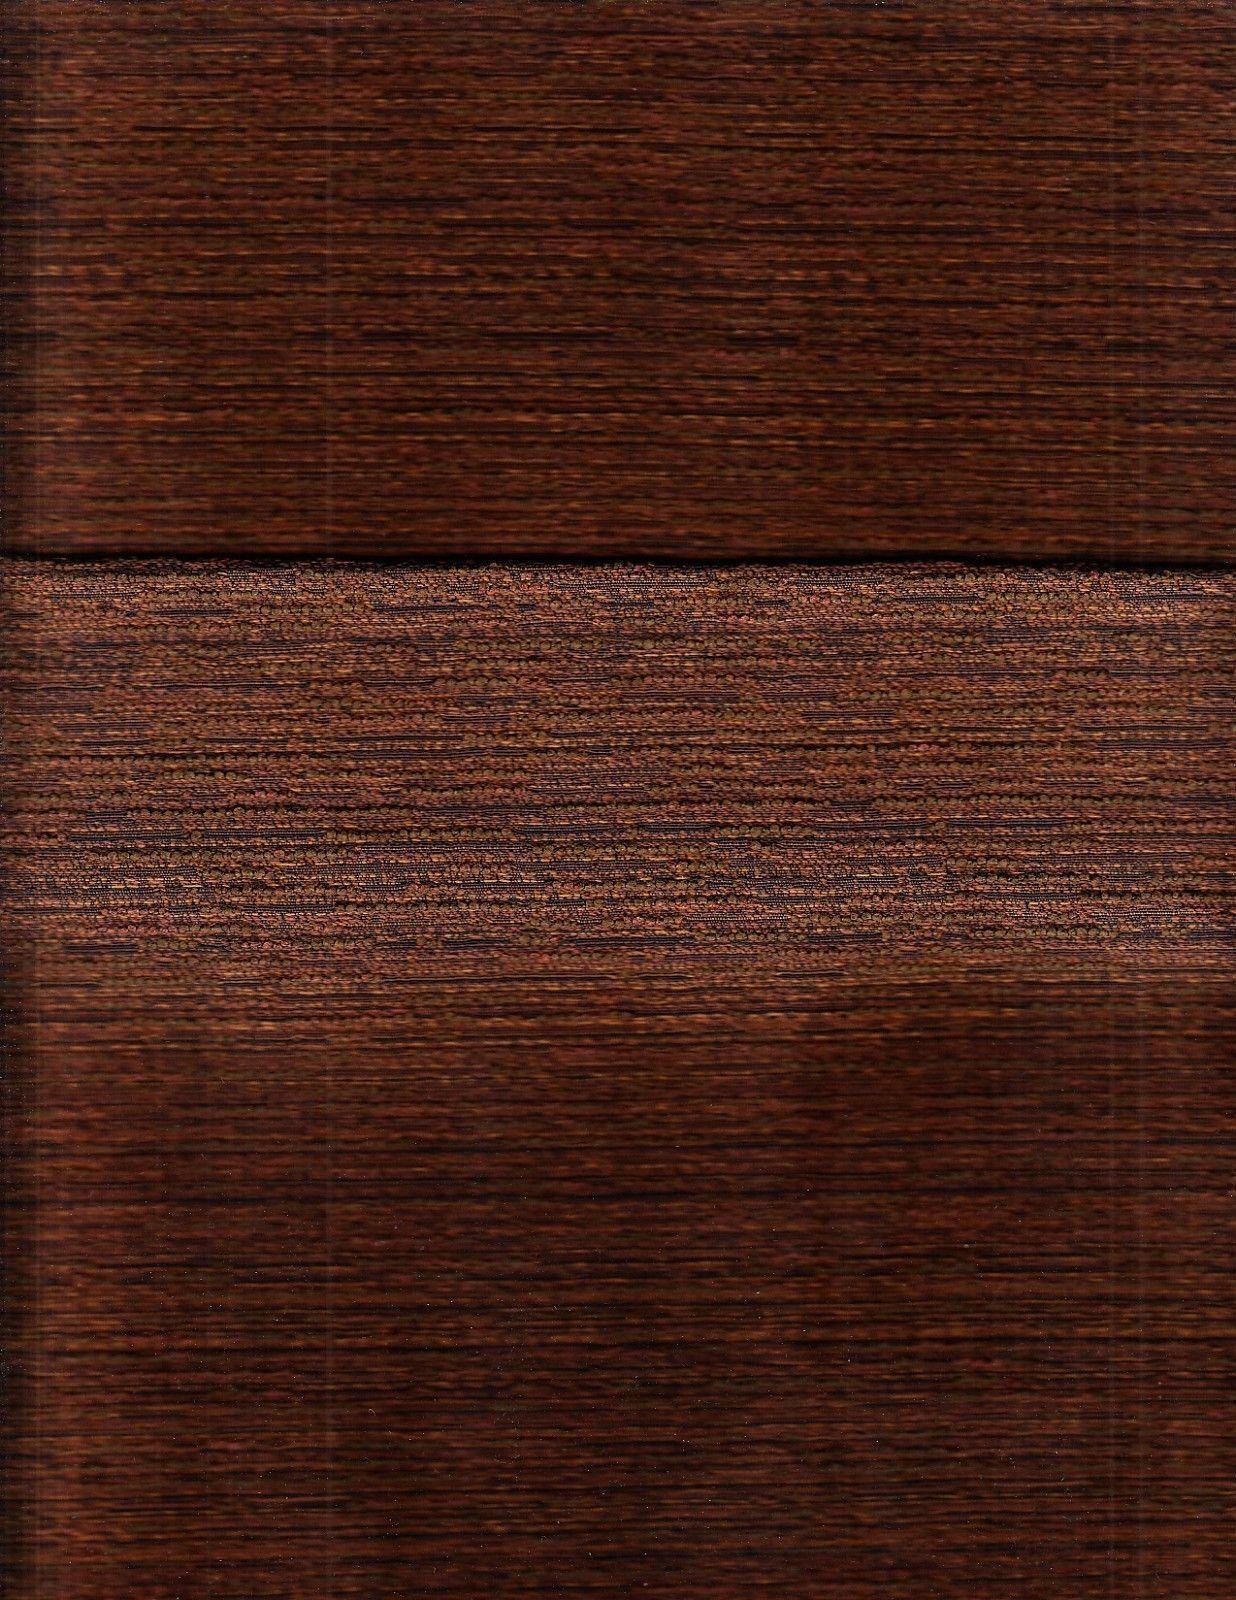 Mid Century Modern Upholstery Fabric Ad Men Tweed Chestnut Brown 14 yds DP2